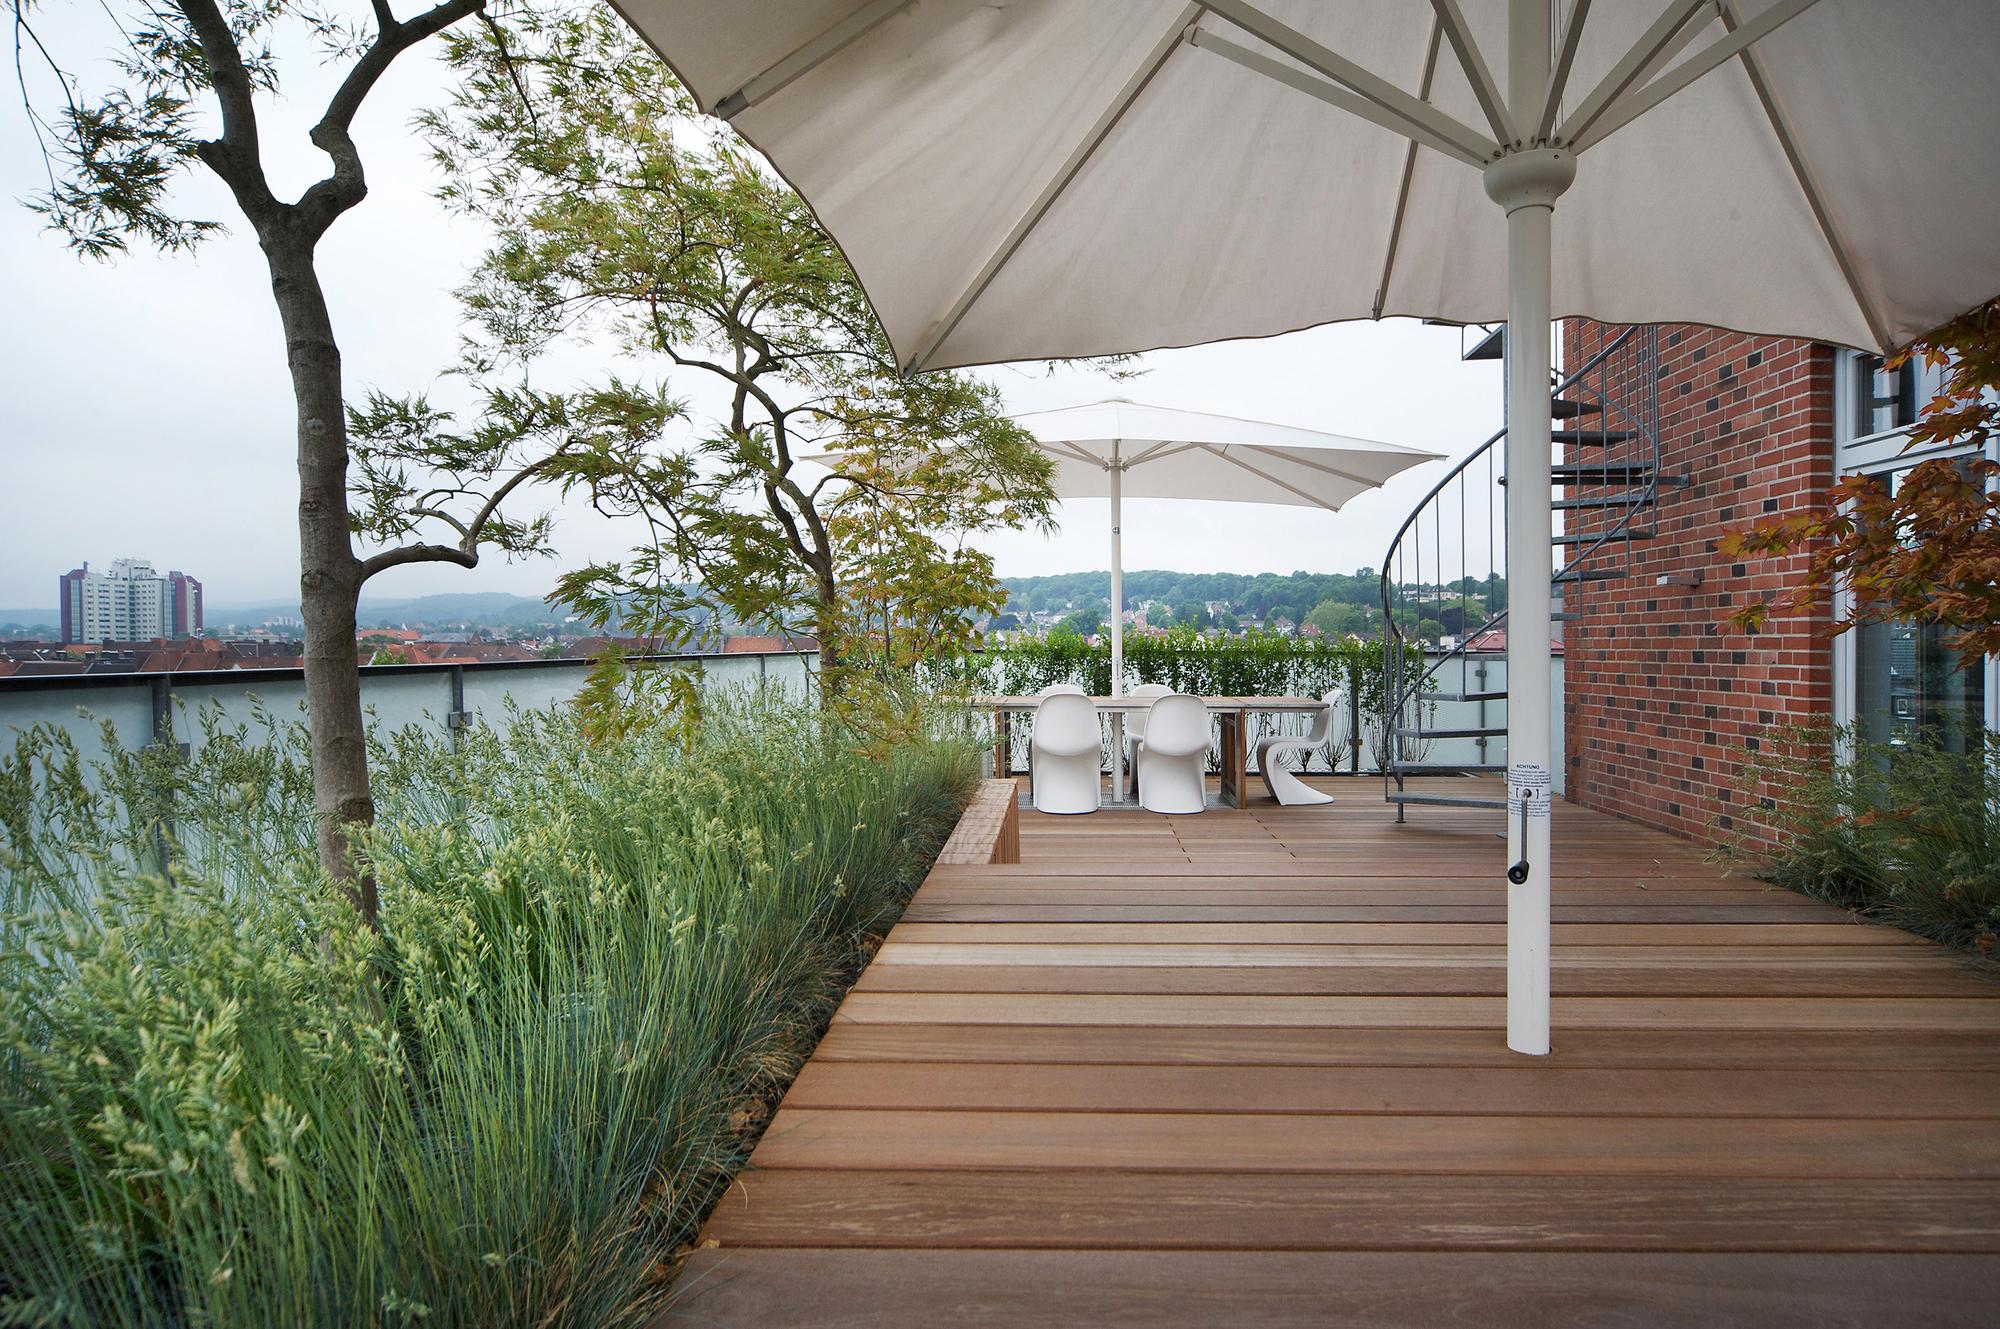 galer a de penthouse en bielefeld architekten. Black Bedroom Furniture Sets. Home Design Ideas